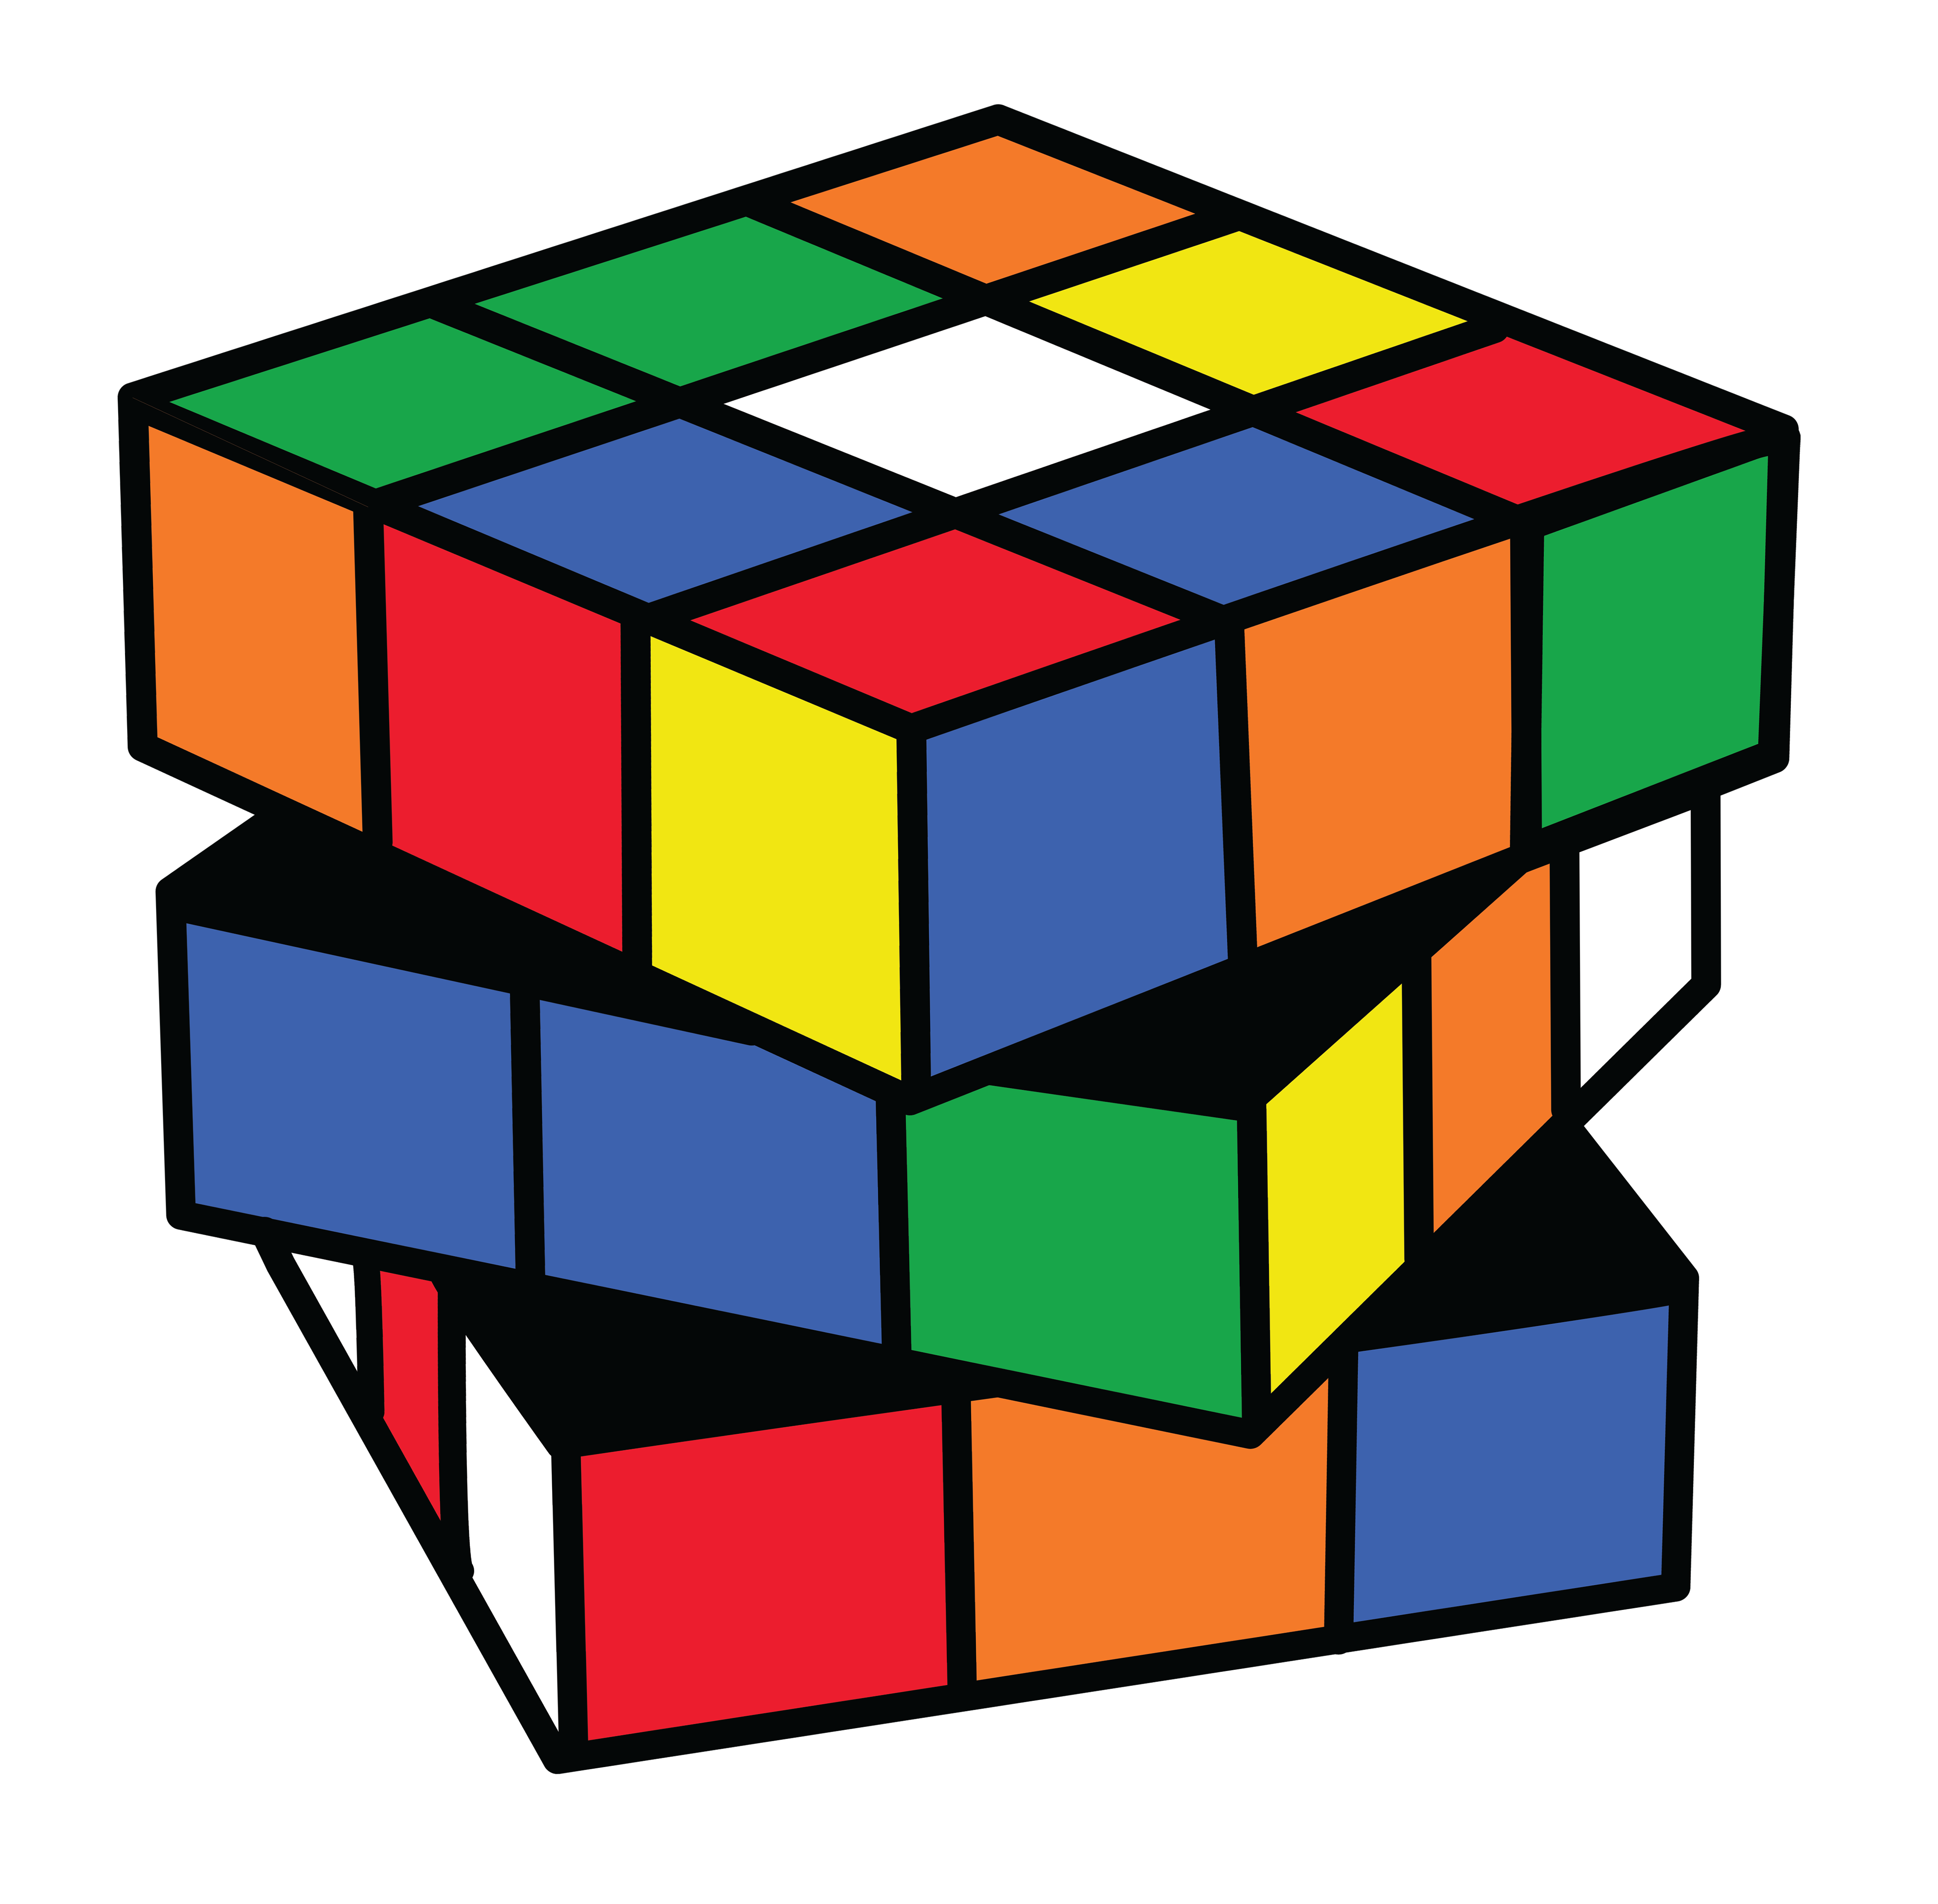 png library stock Rubix color clip art. Rubik clipart cube box.